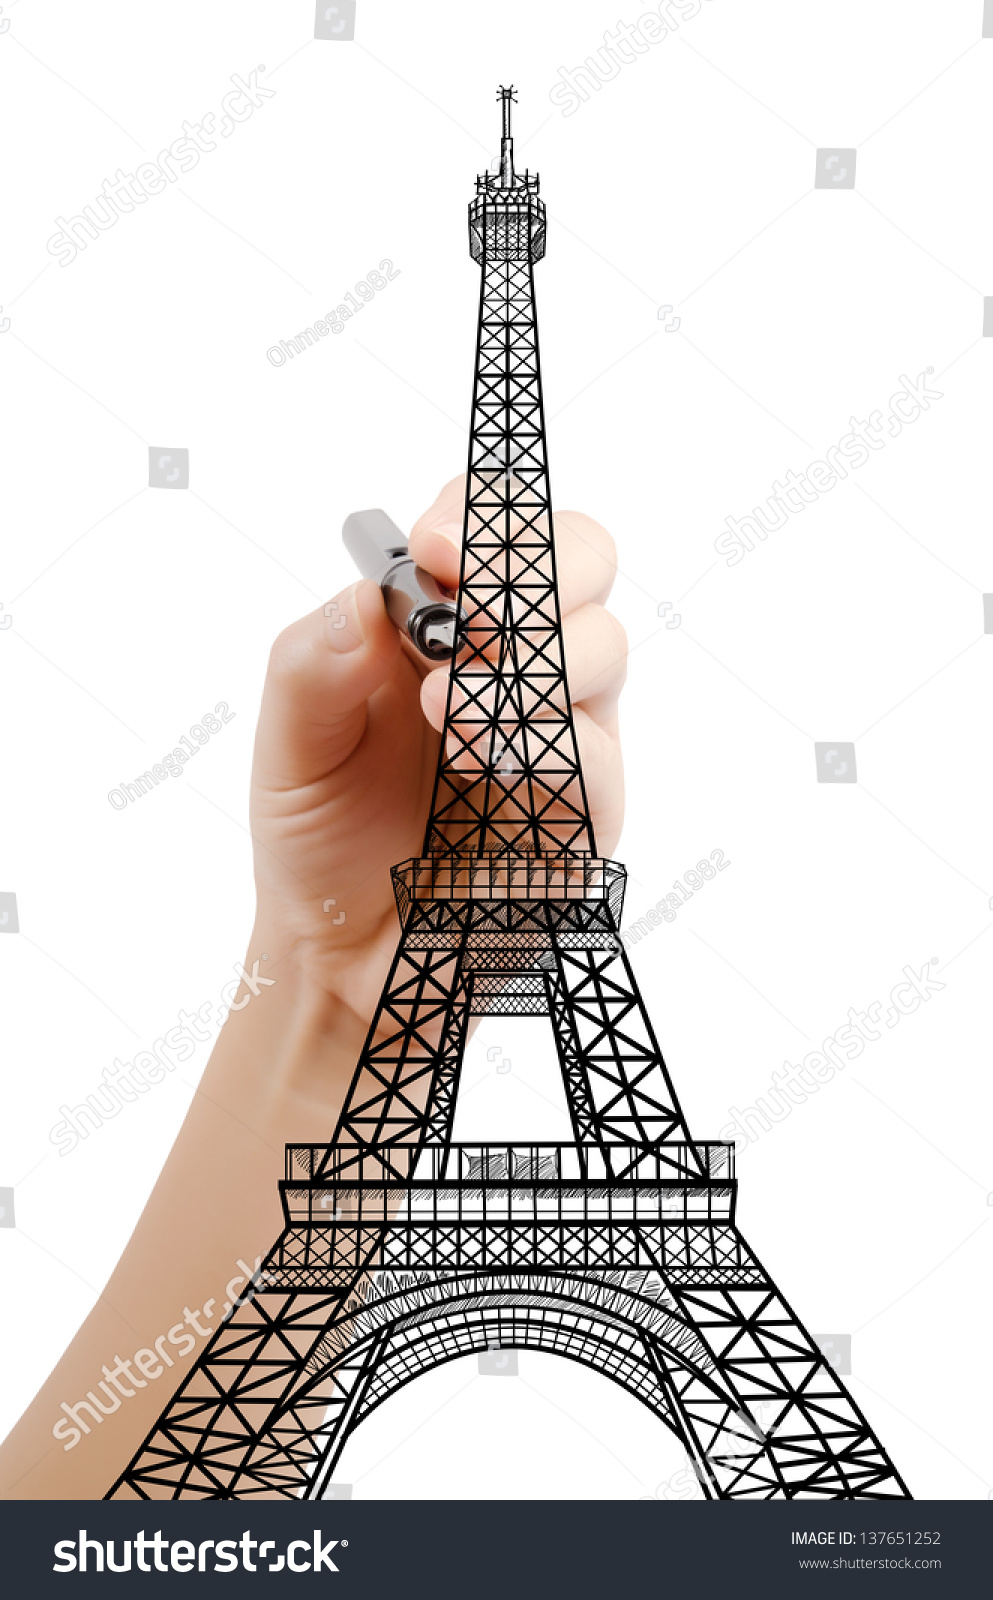 Line Art Eiffel Tower : Hand drawing eiffel tower line paris stock illustration